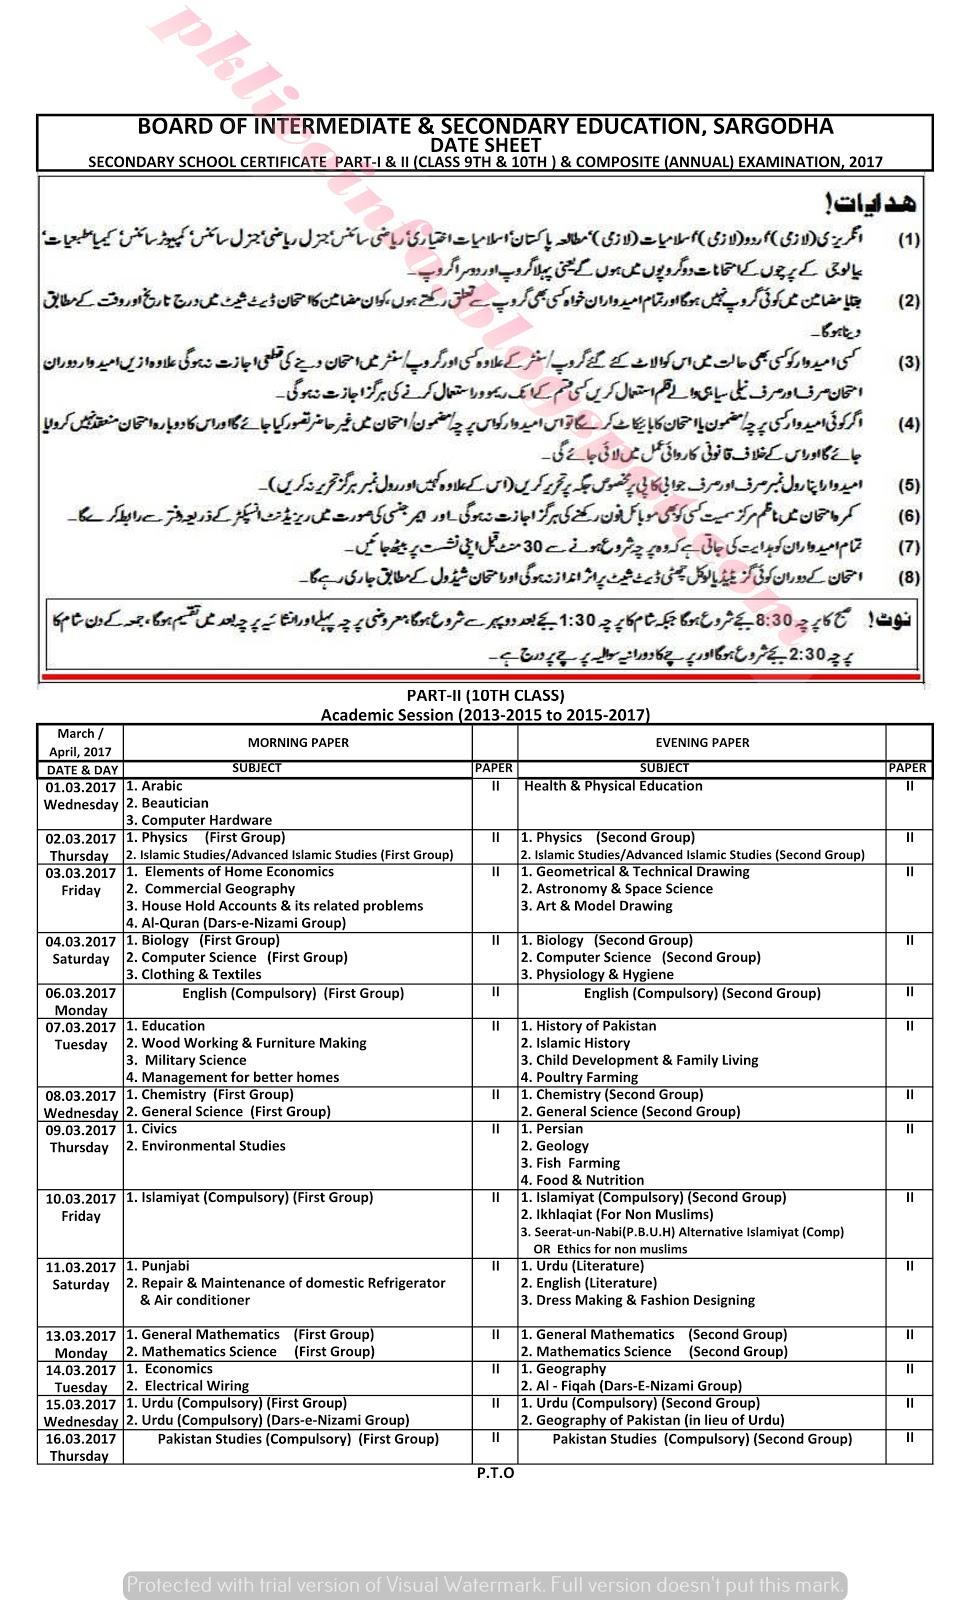 BISE Sargodha Board Date Sheet 9th Class & 10th Class 2017